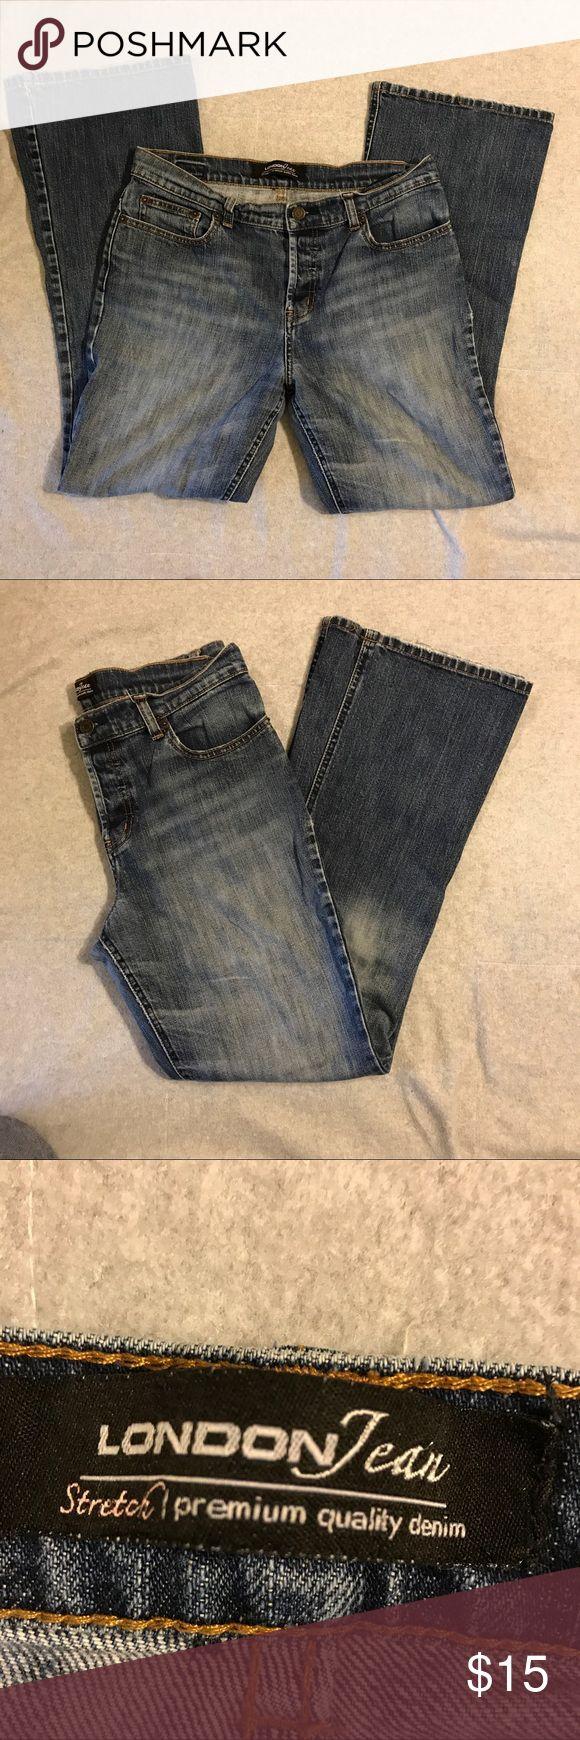 Victoria's Secret London Jeans Pre-loved but in excellent condition! Very soft denim! Victoria's Secret Jeans Boot Cut